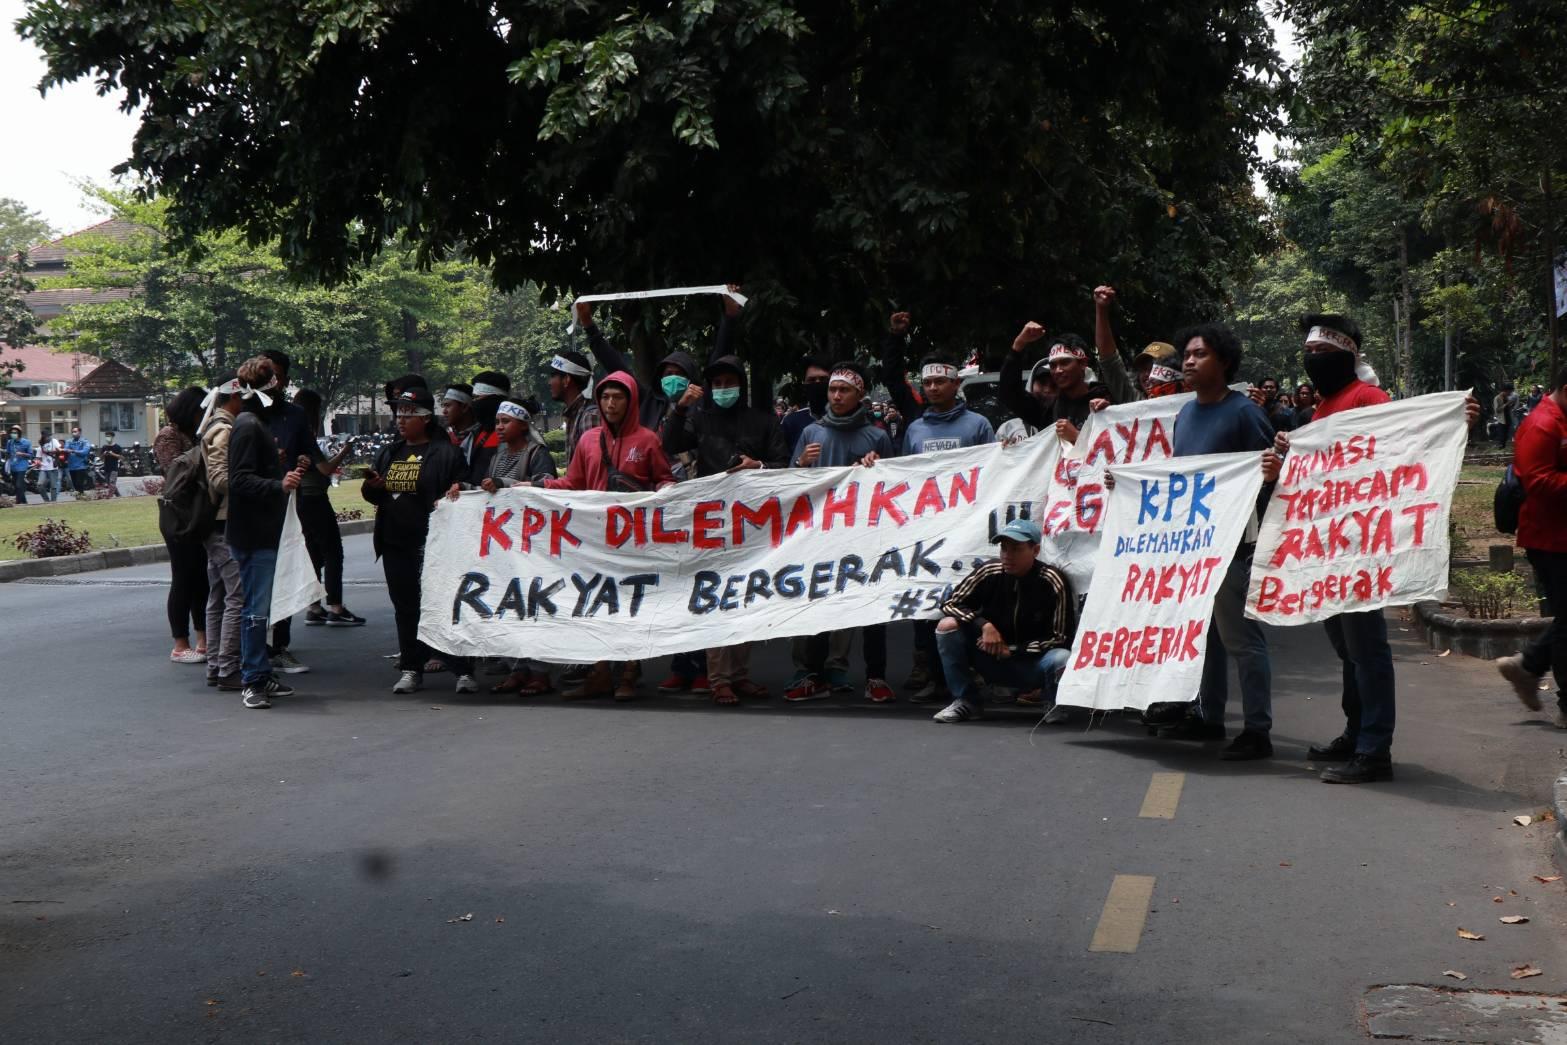 Pelemahan KPK dan Obstruction of Justice Para Koruptor dalam Pusaran Kelembagaan Negara